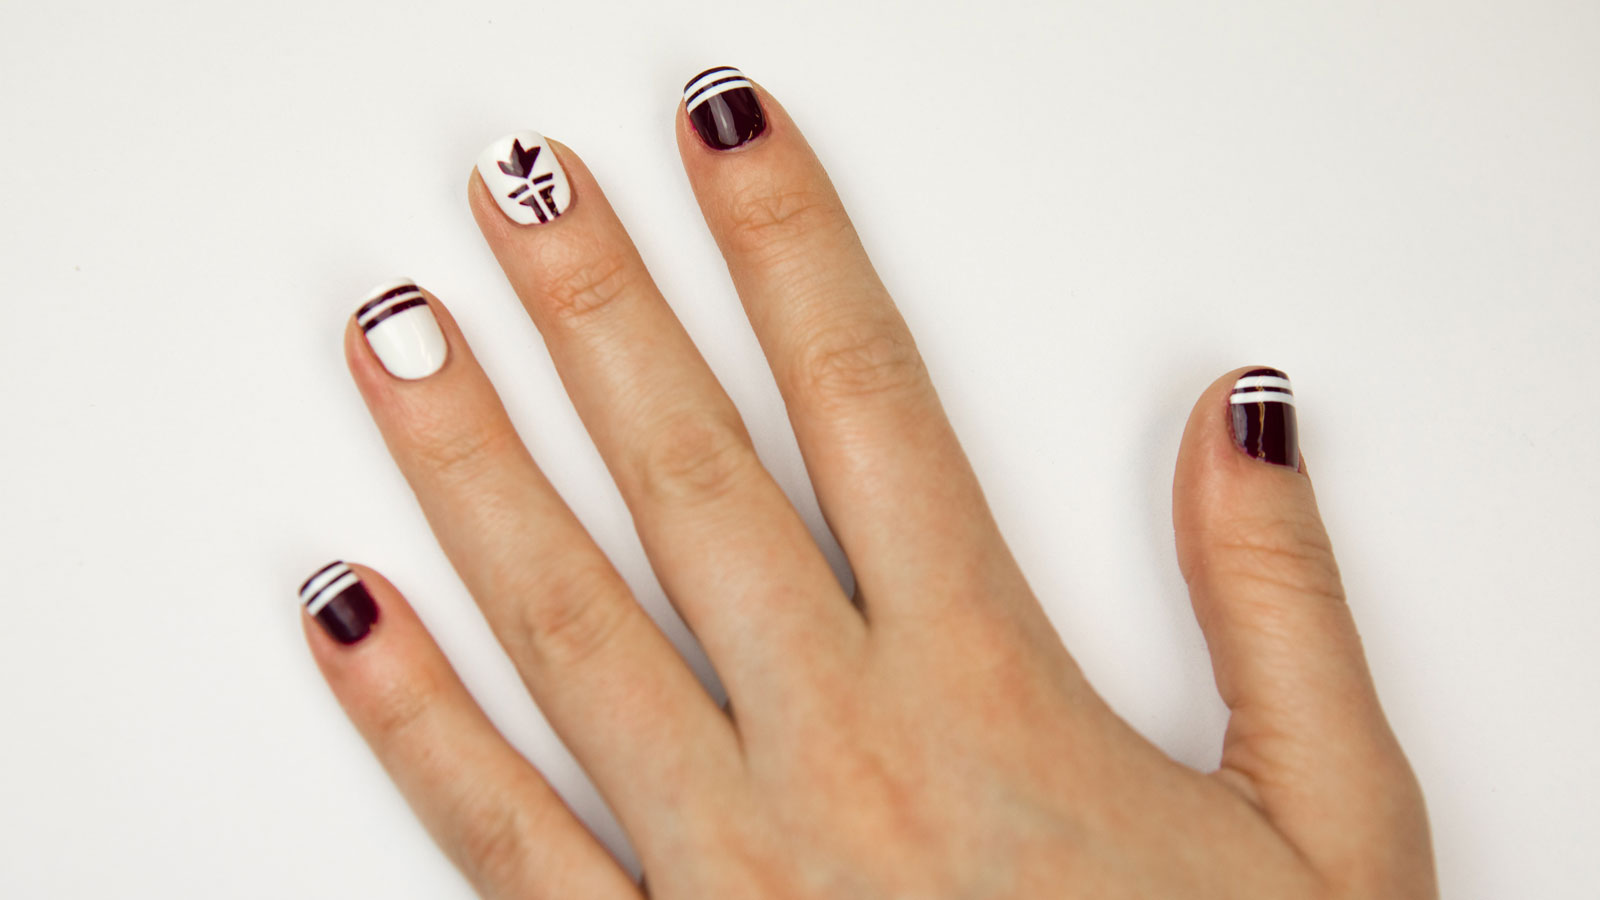 hallie's nails